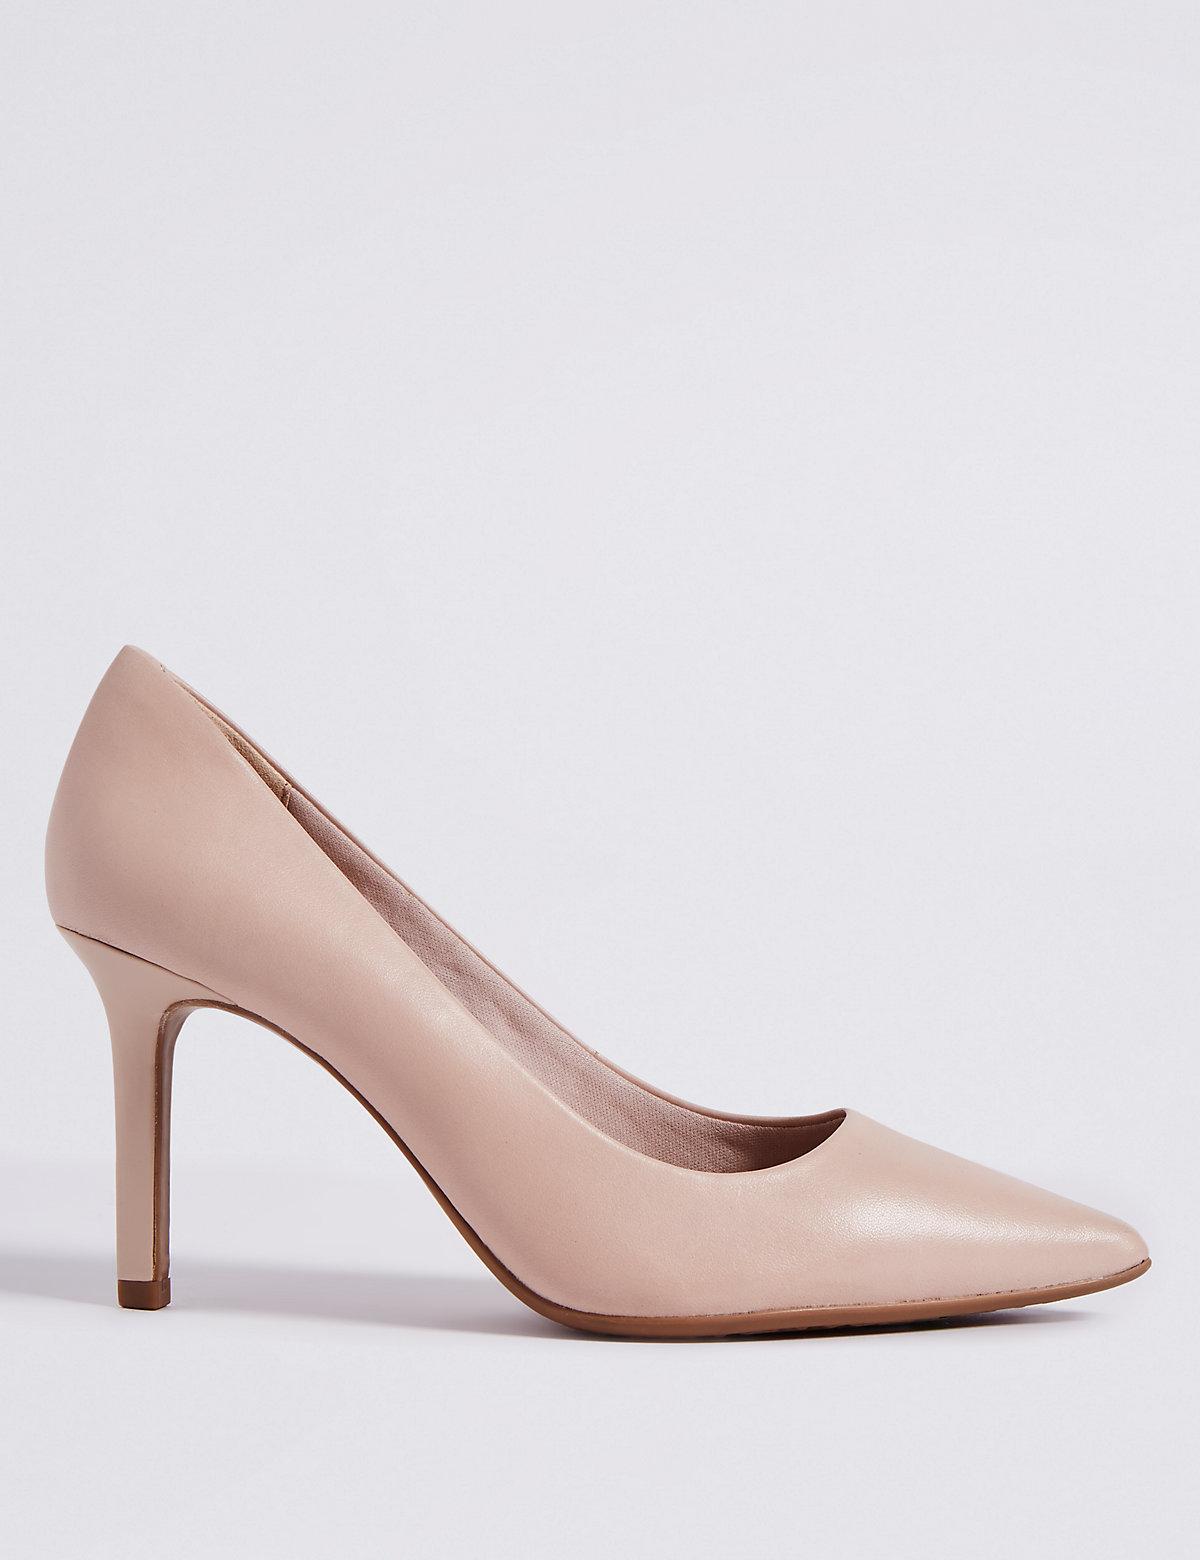 Slave girl nude high heels